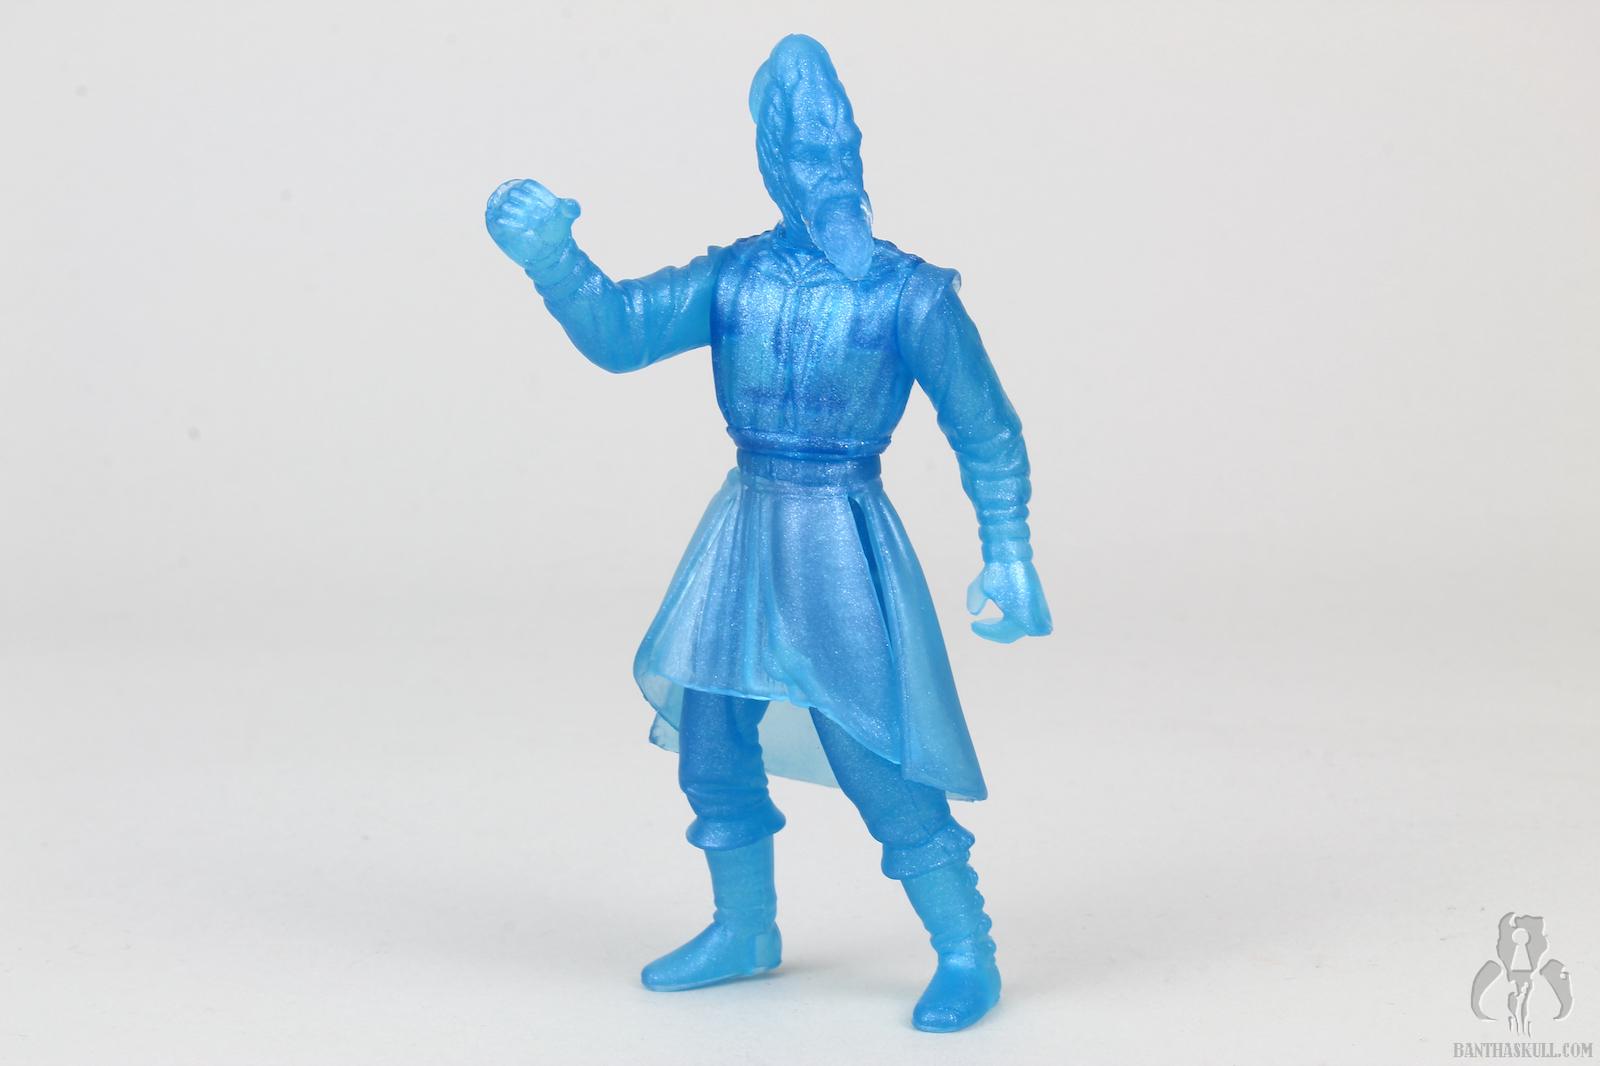 Holographic Ki-Adi-Mundi #027 - Sealed 3.75 figure - Star